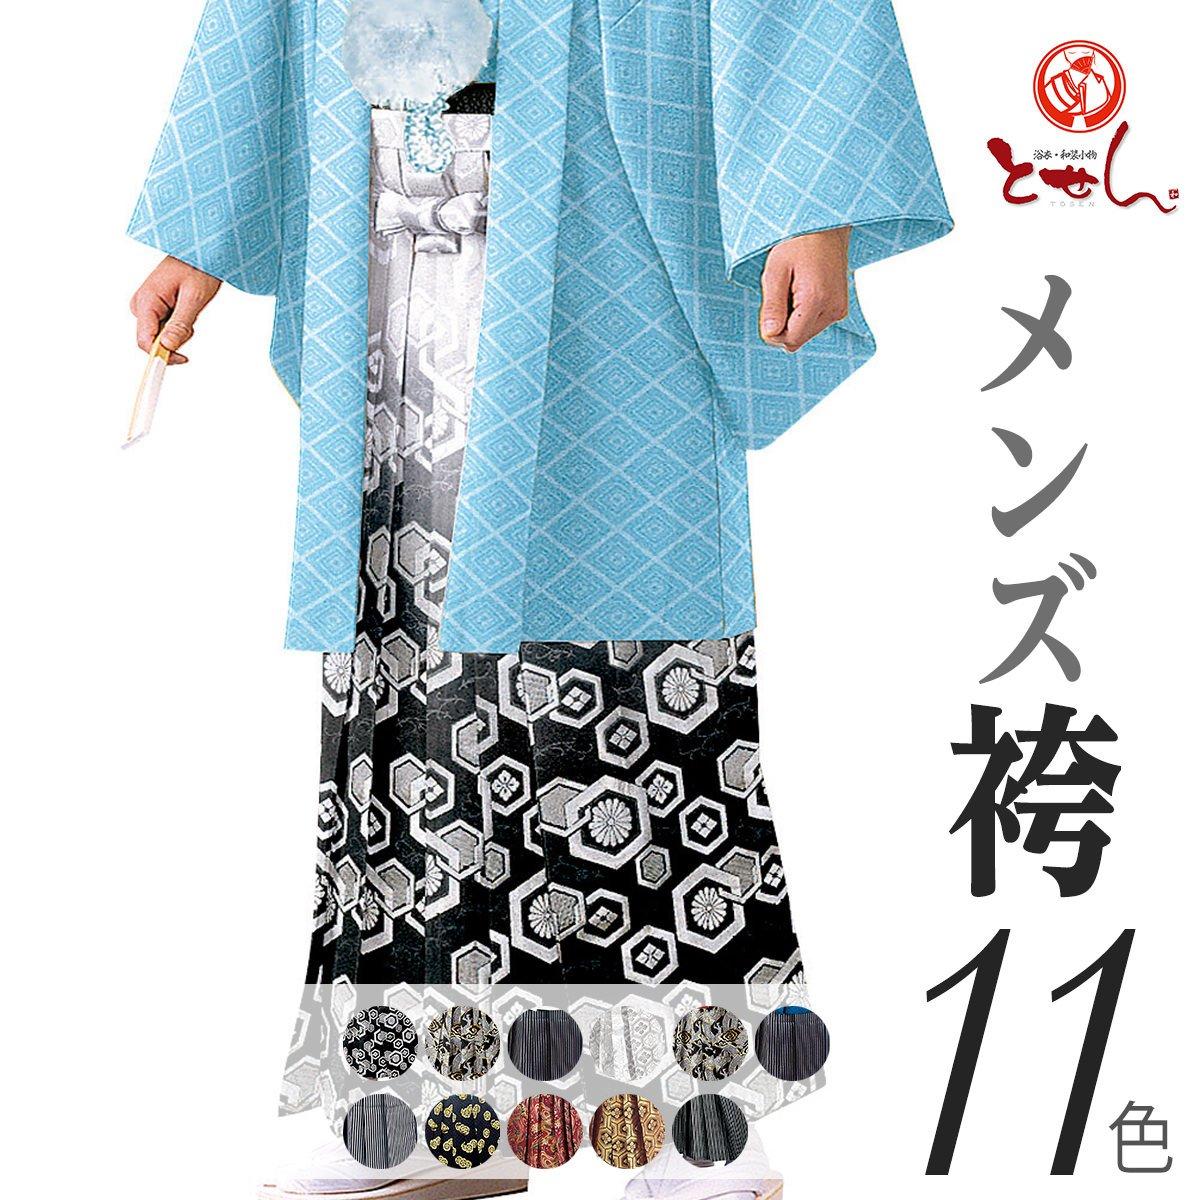 Hakama Collection 2018年新柄 メンズ 紋付 袴 殿方 B0791WHL8Y 9号(紐下丈99cm)|A:白銀亀甲ボカシ A:白銀亀甲ボカシ 9号(紐下丈99cm)